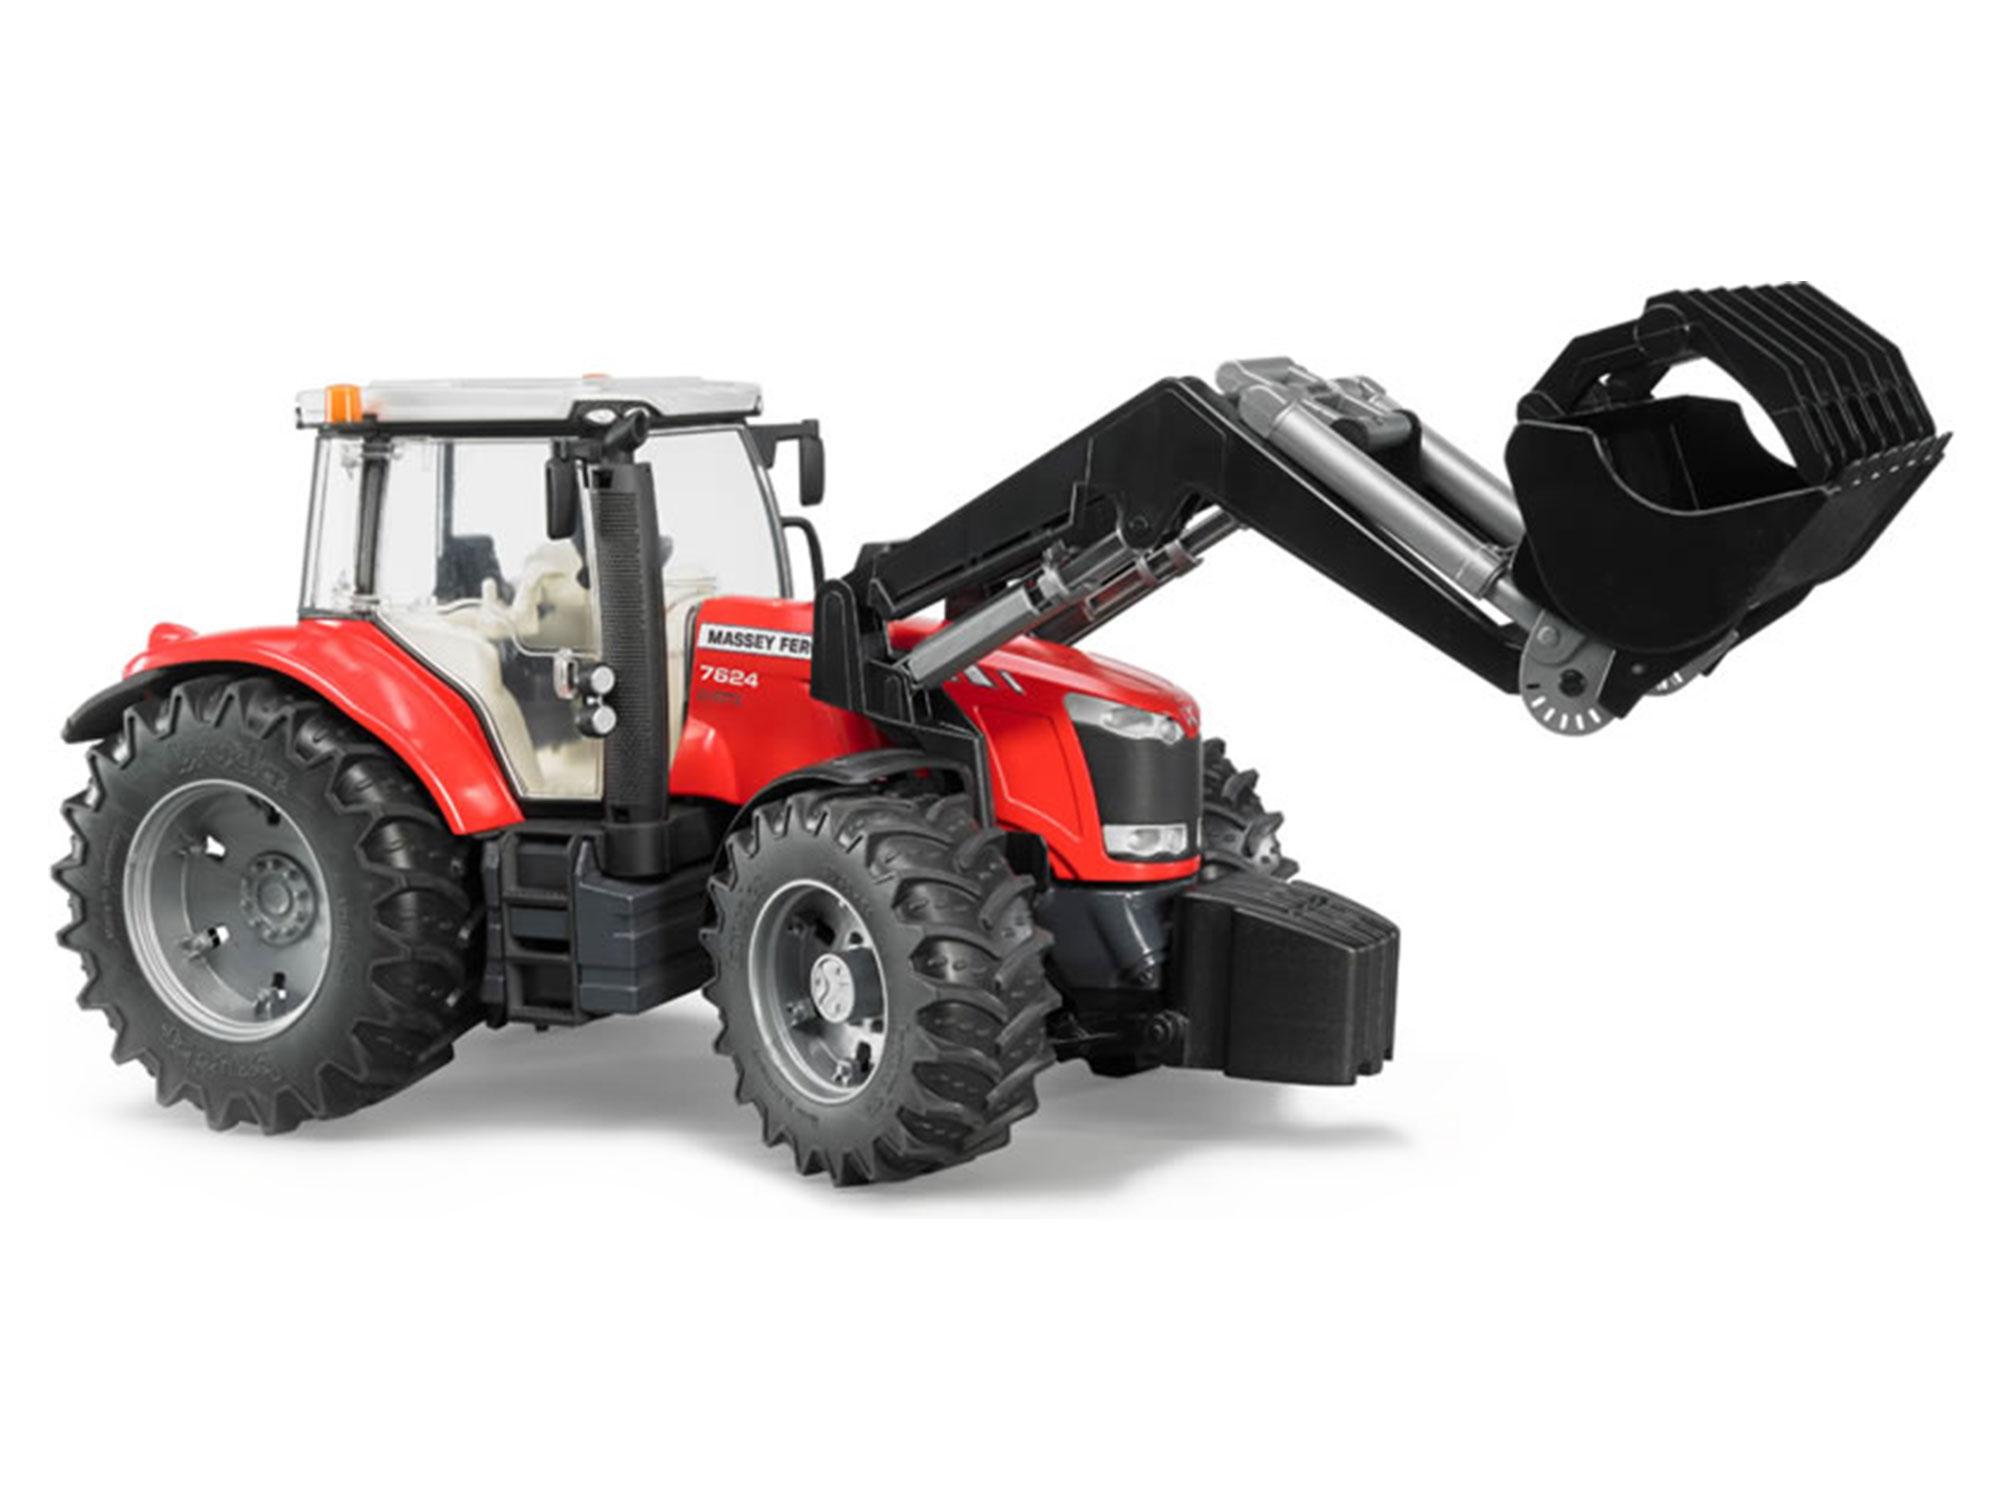 Bruder MF 7624 Tractor with Loader